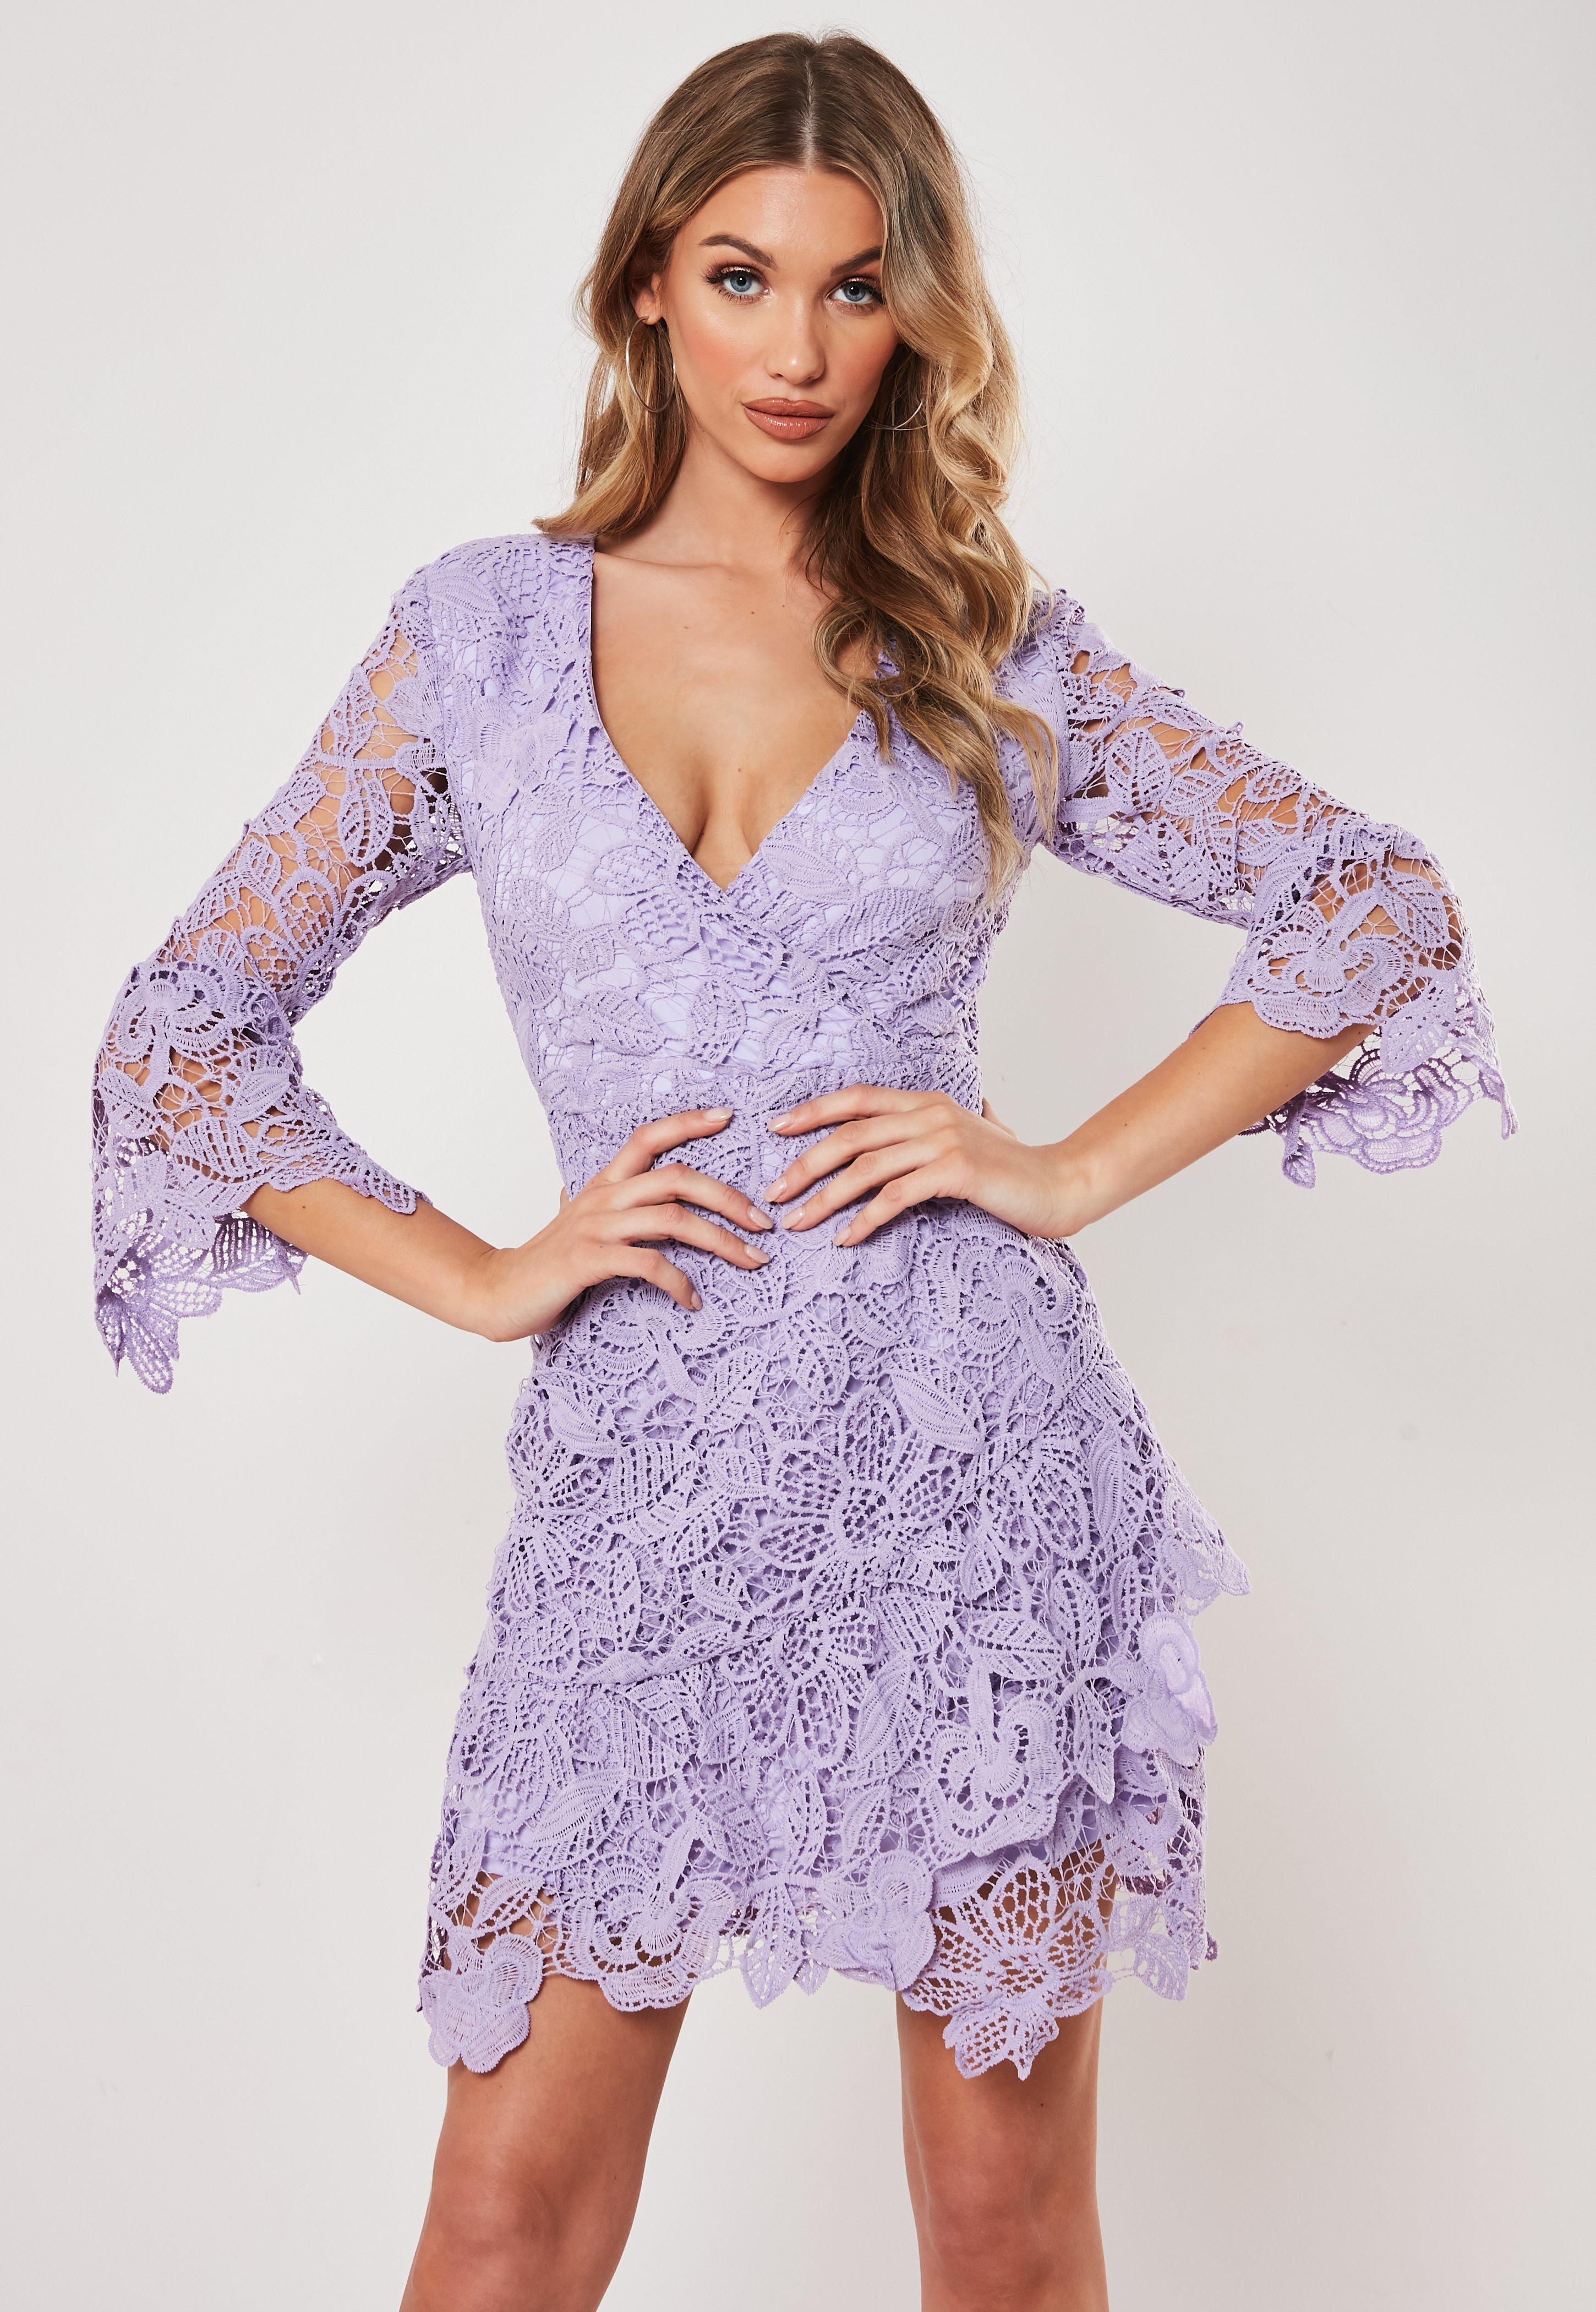 3daf0947a10f2a Purple Dresses | Mauve & Lilac Dresses - Missguided